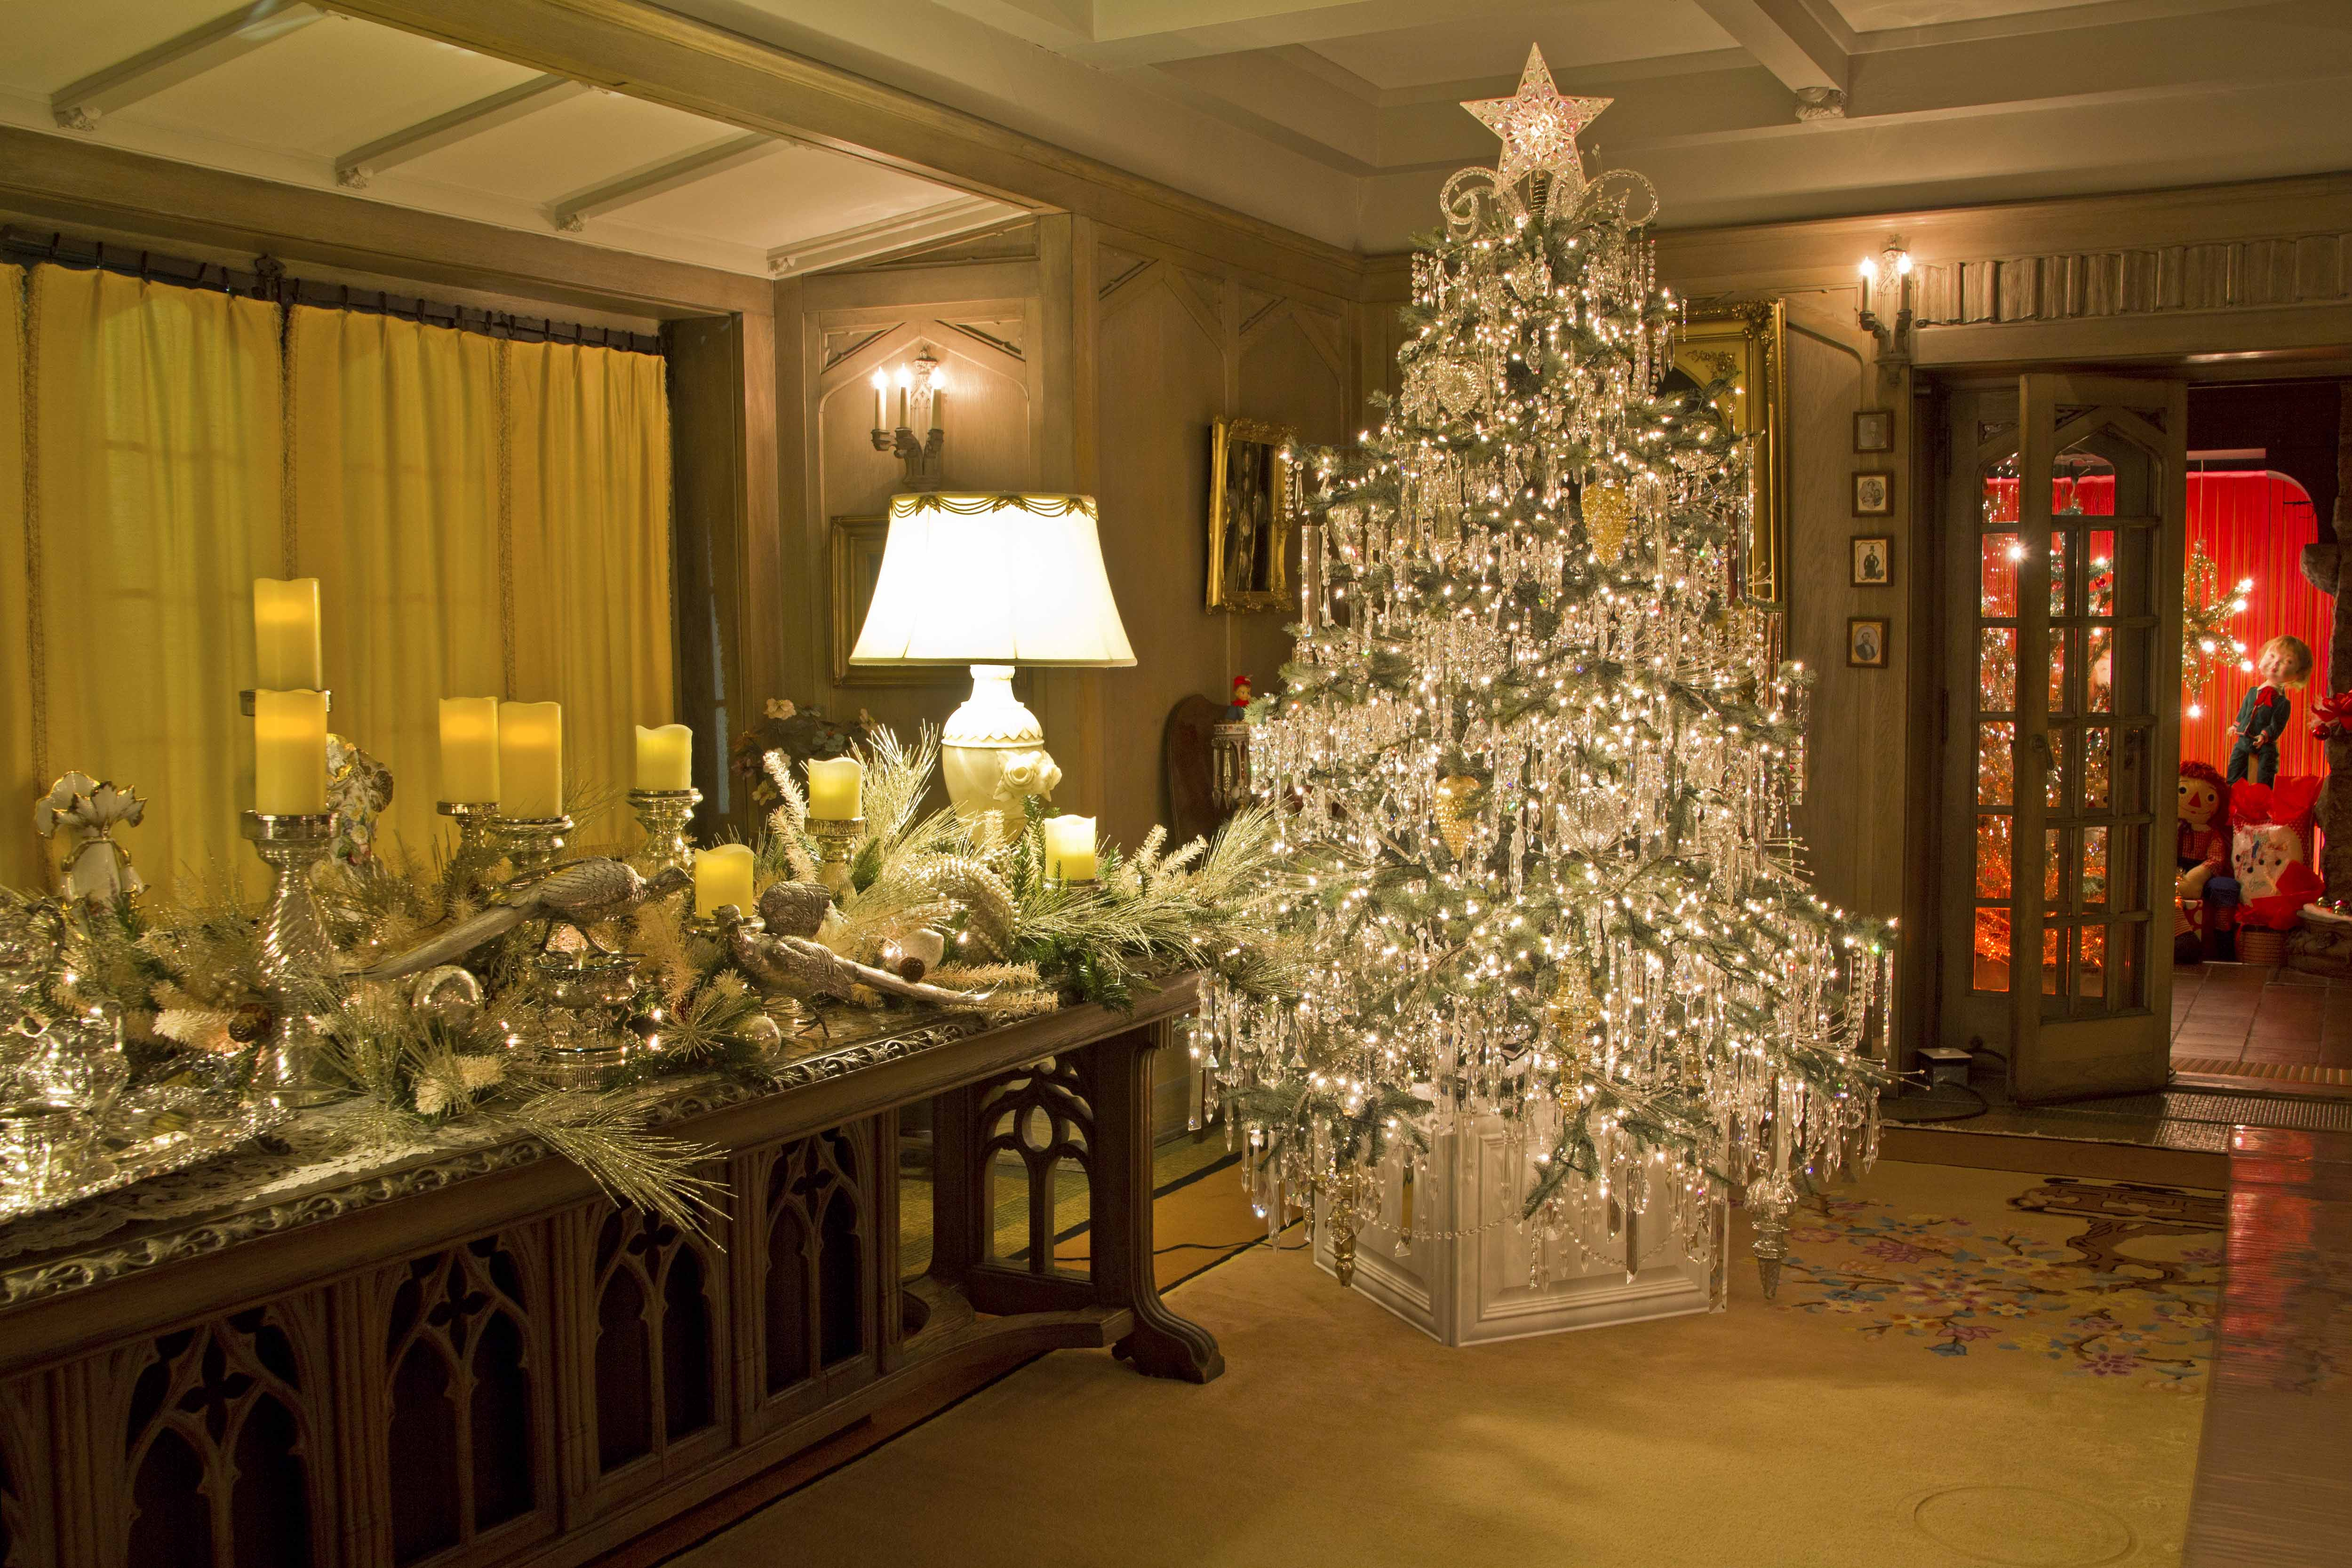 Memories of Christmas Past | Mahoning Valley Historical Society